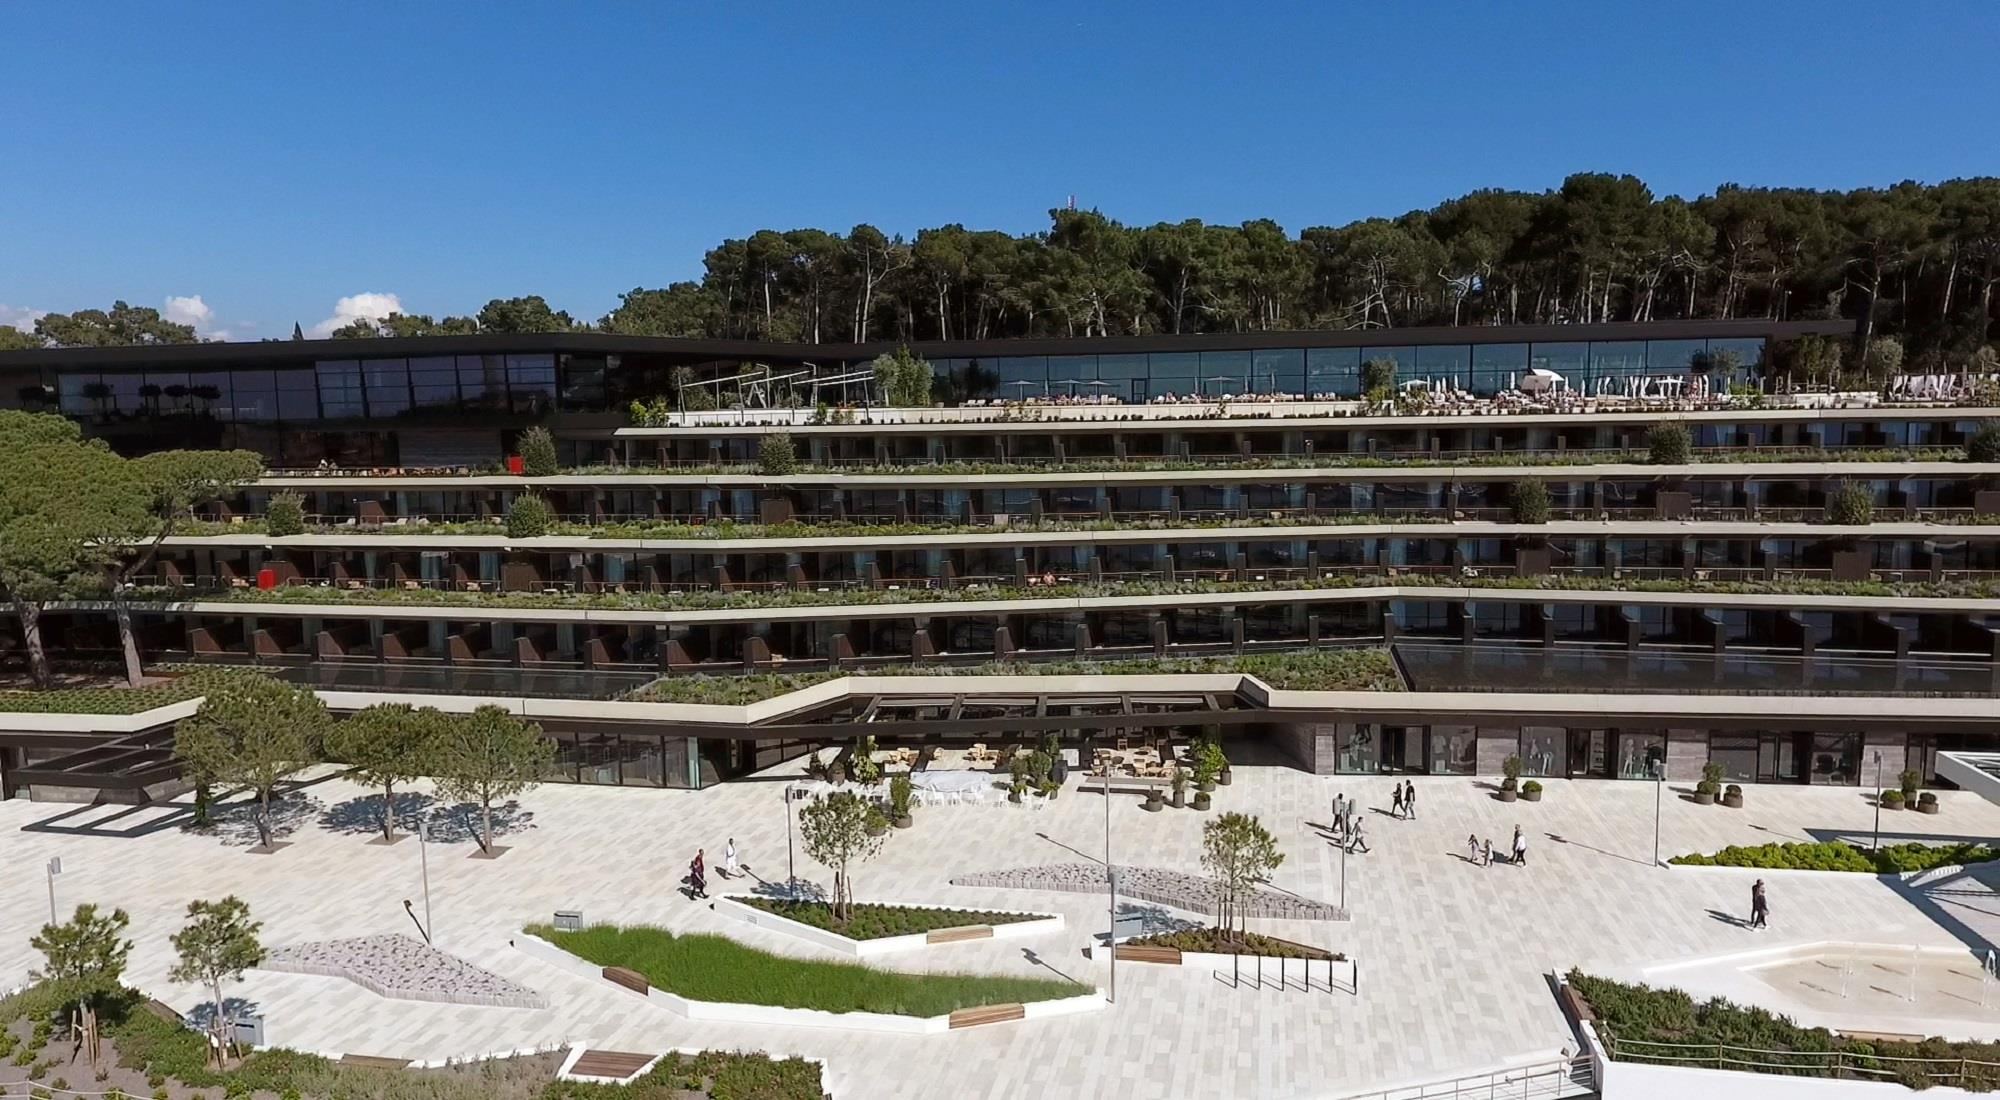 https://alukoenigstahl.md/wp-content/uploads/sites/4/2020/09/Grand-Park-Hotel-Rovinj1.jpg